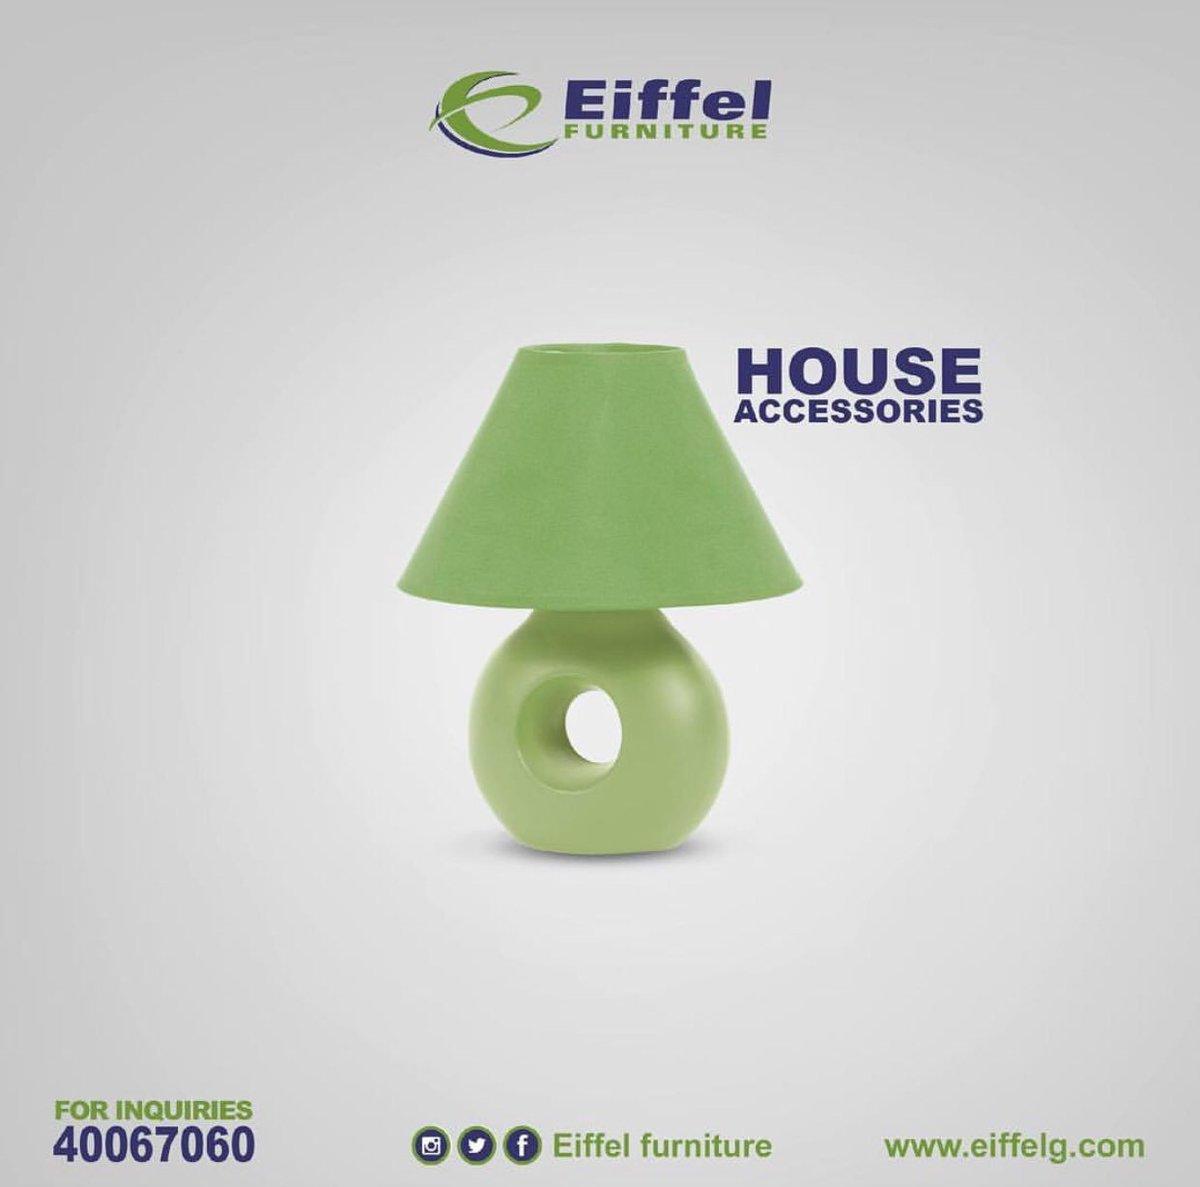 Eiffel Furniture on Twitter: \